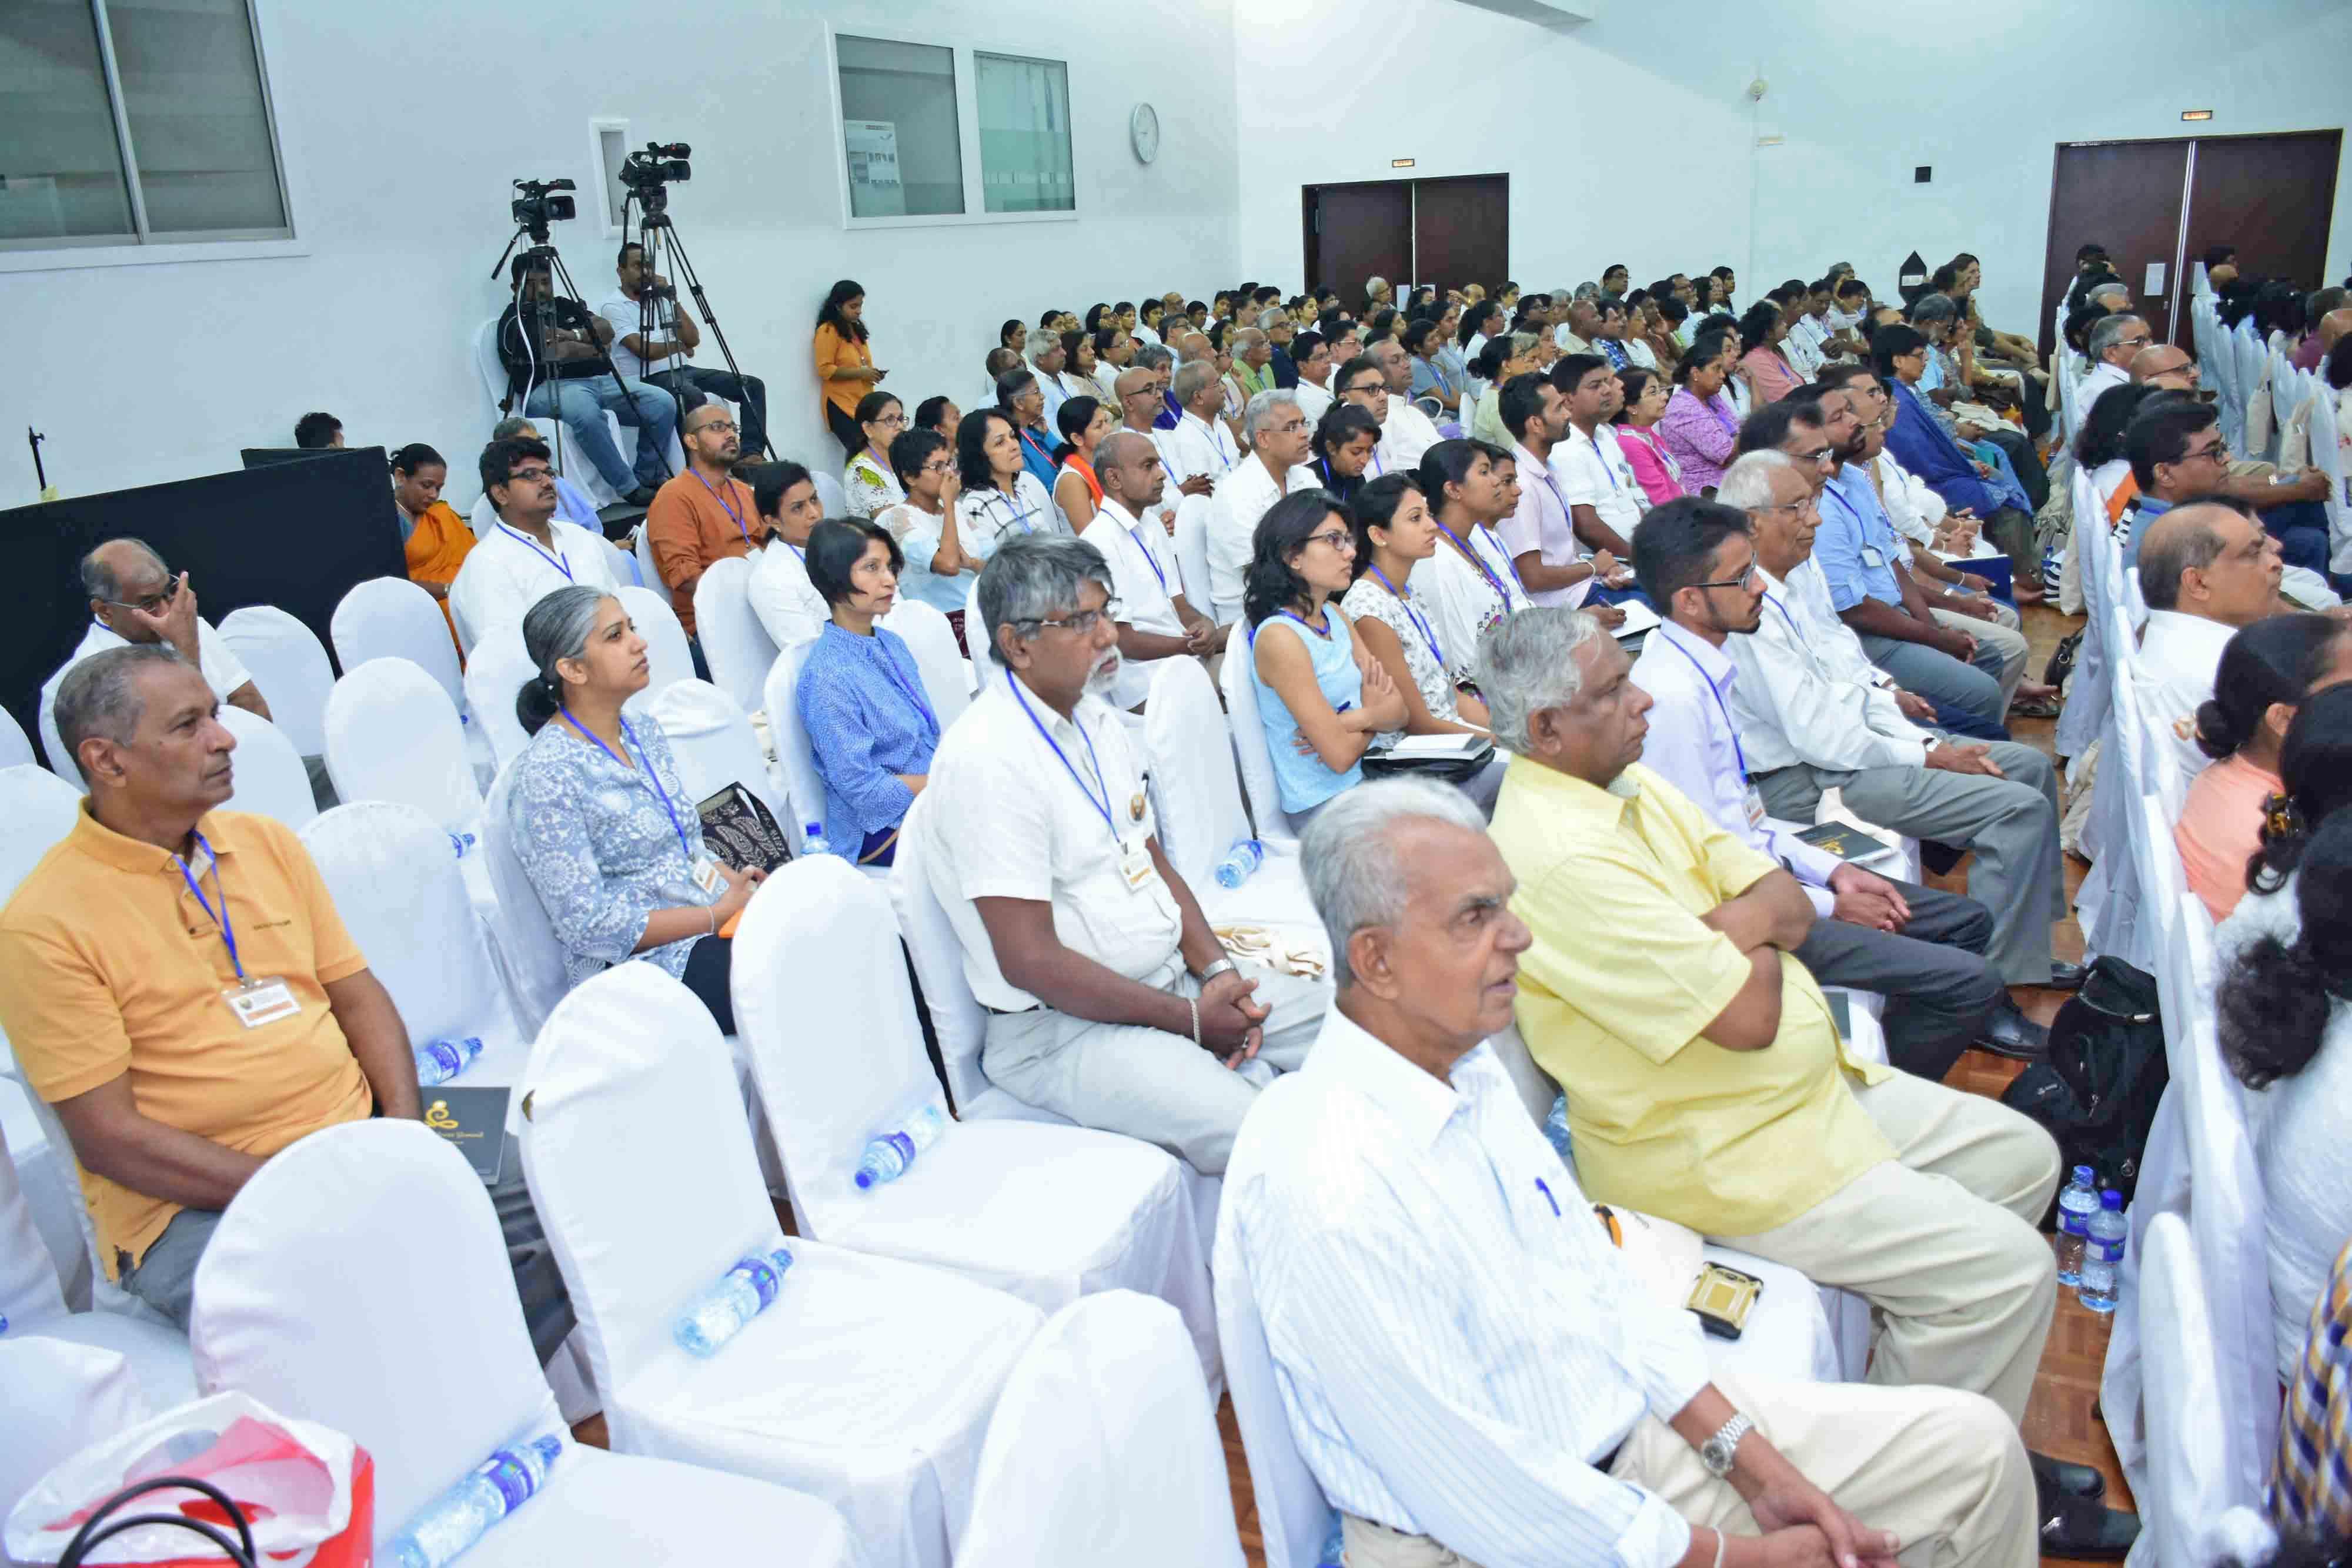 Global Mindfulness Summit 2018 - Day2 (28)